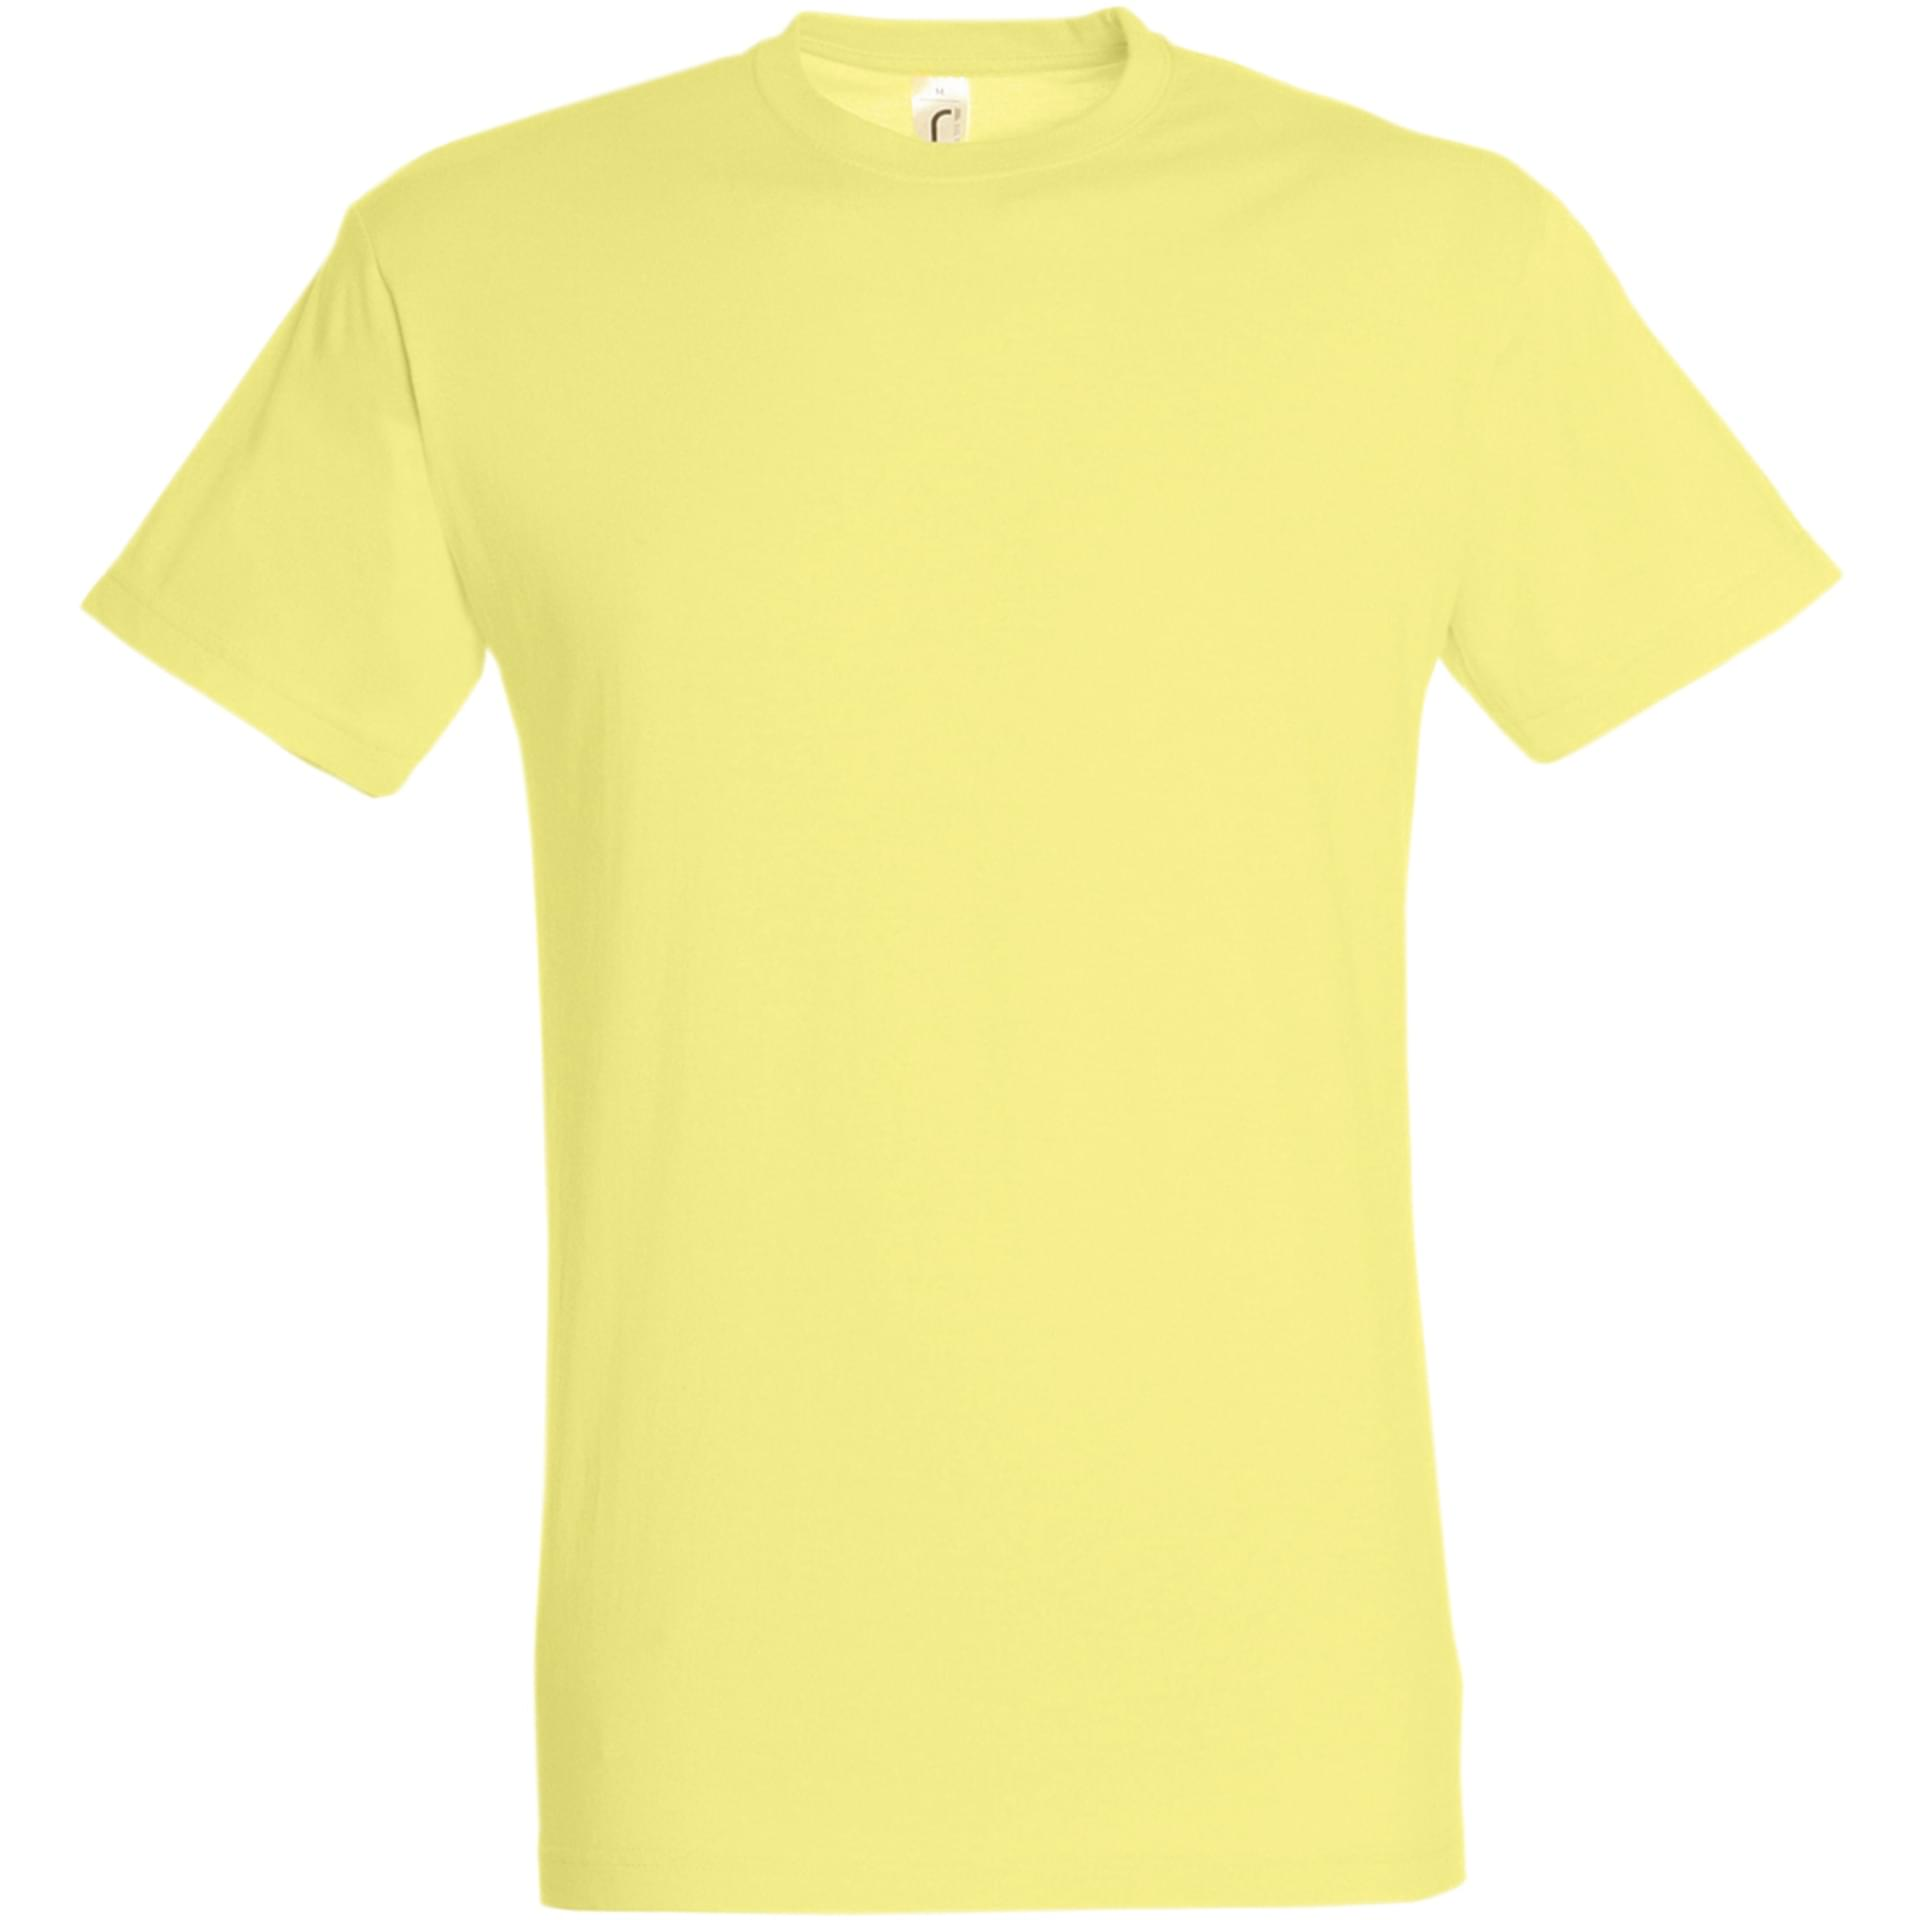 tee shirt personnalis regent sol 39 s jaune pale. Black Bedroom Furniture Sets. Home Design Ideas